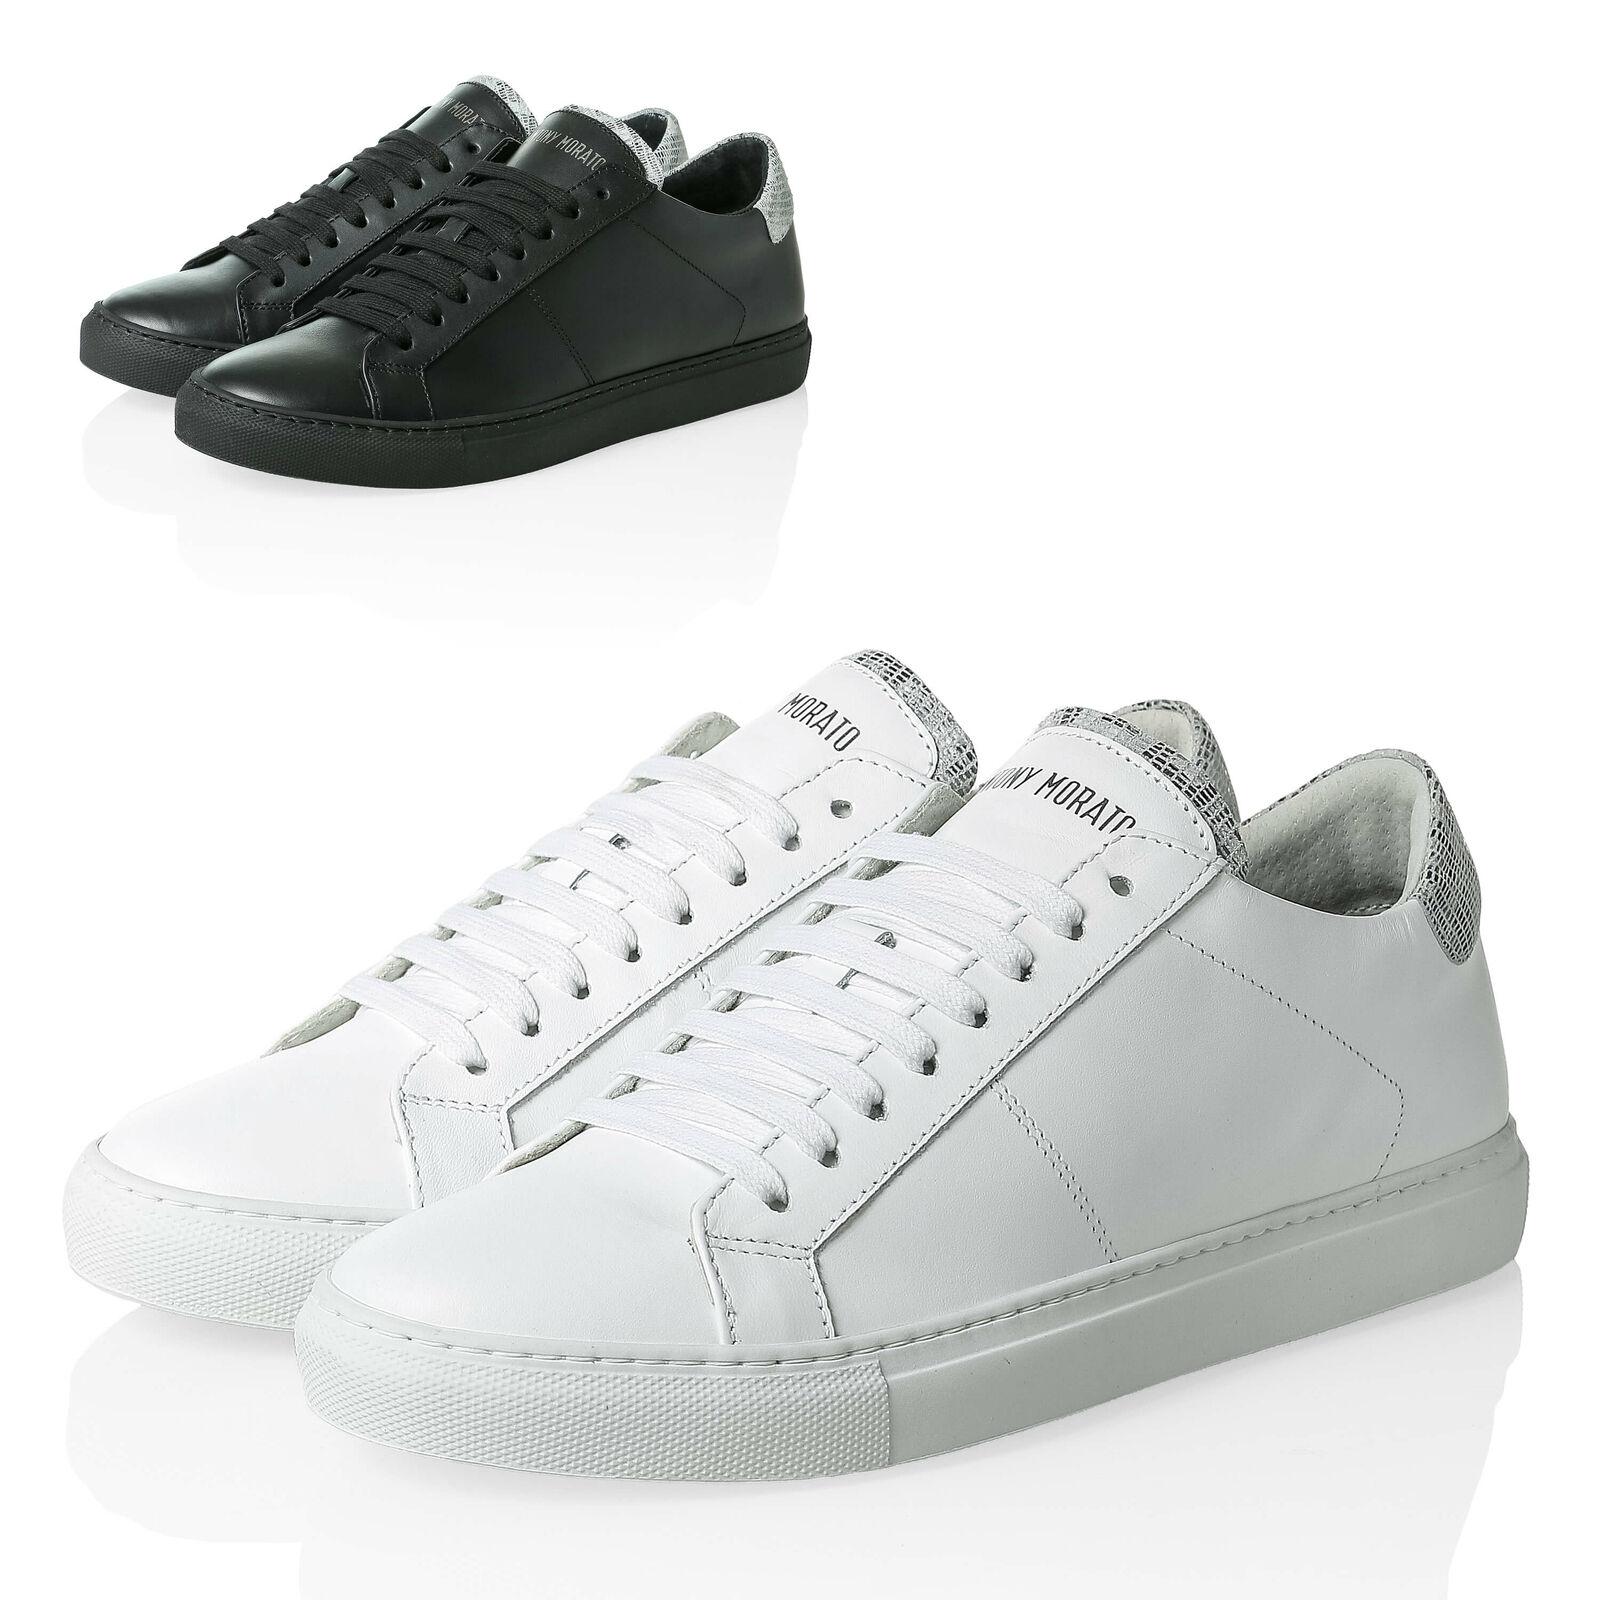 Antony Morato Hommes Faible Top paniers en véritable cuir Chaussures hommes chaussures SALE%